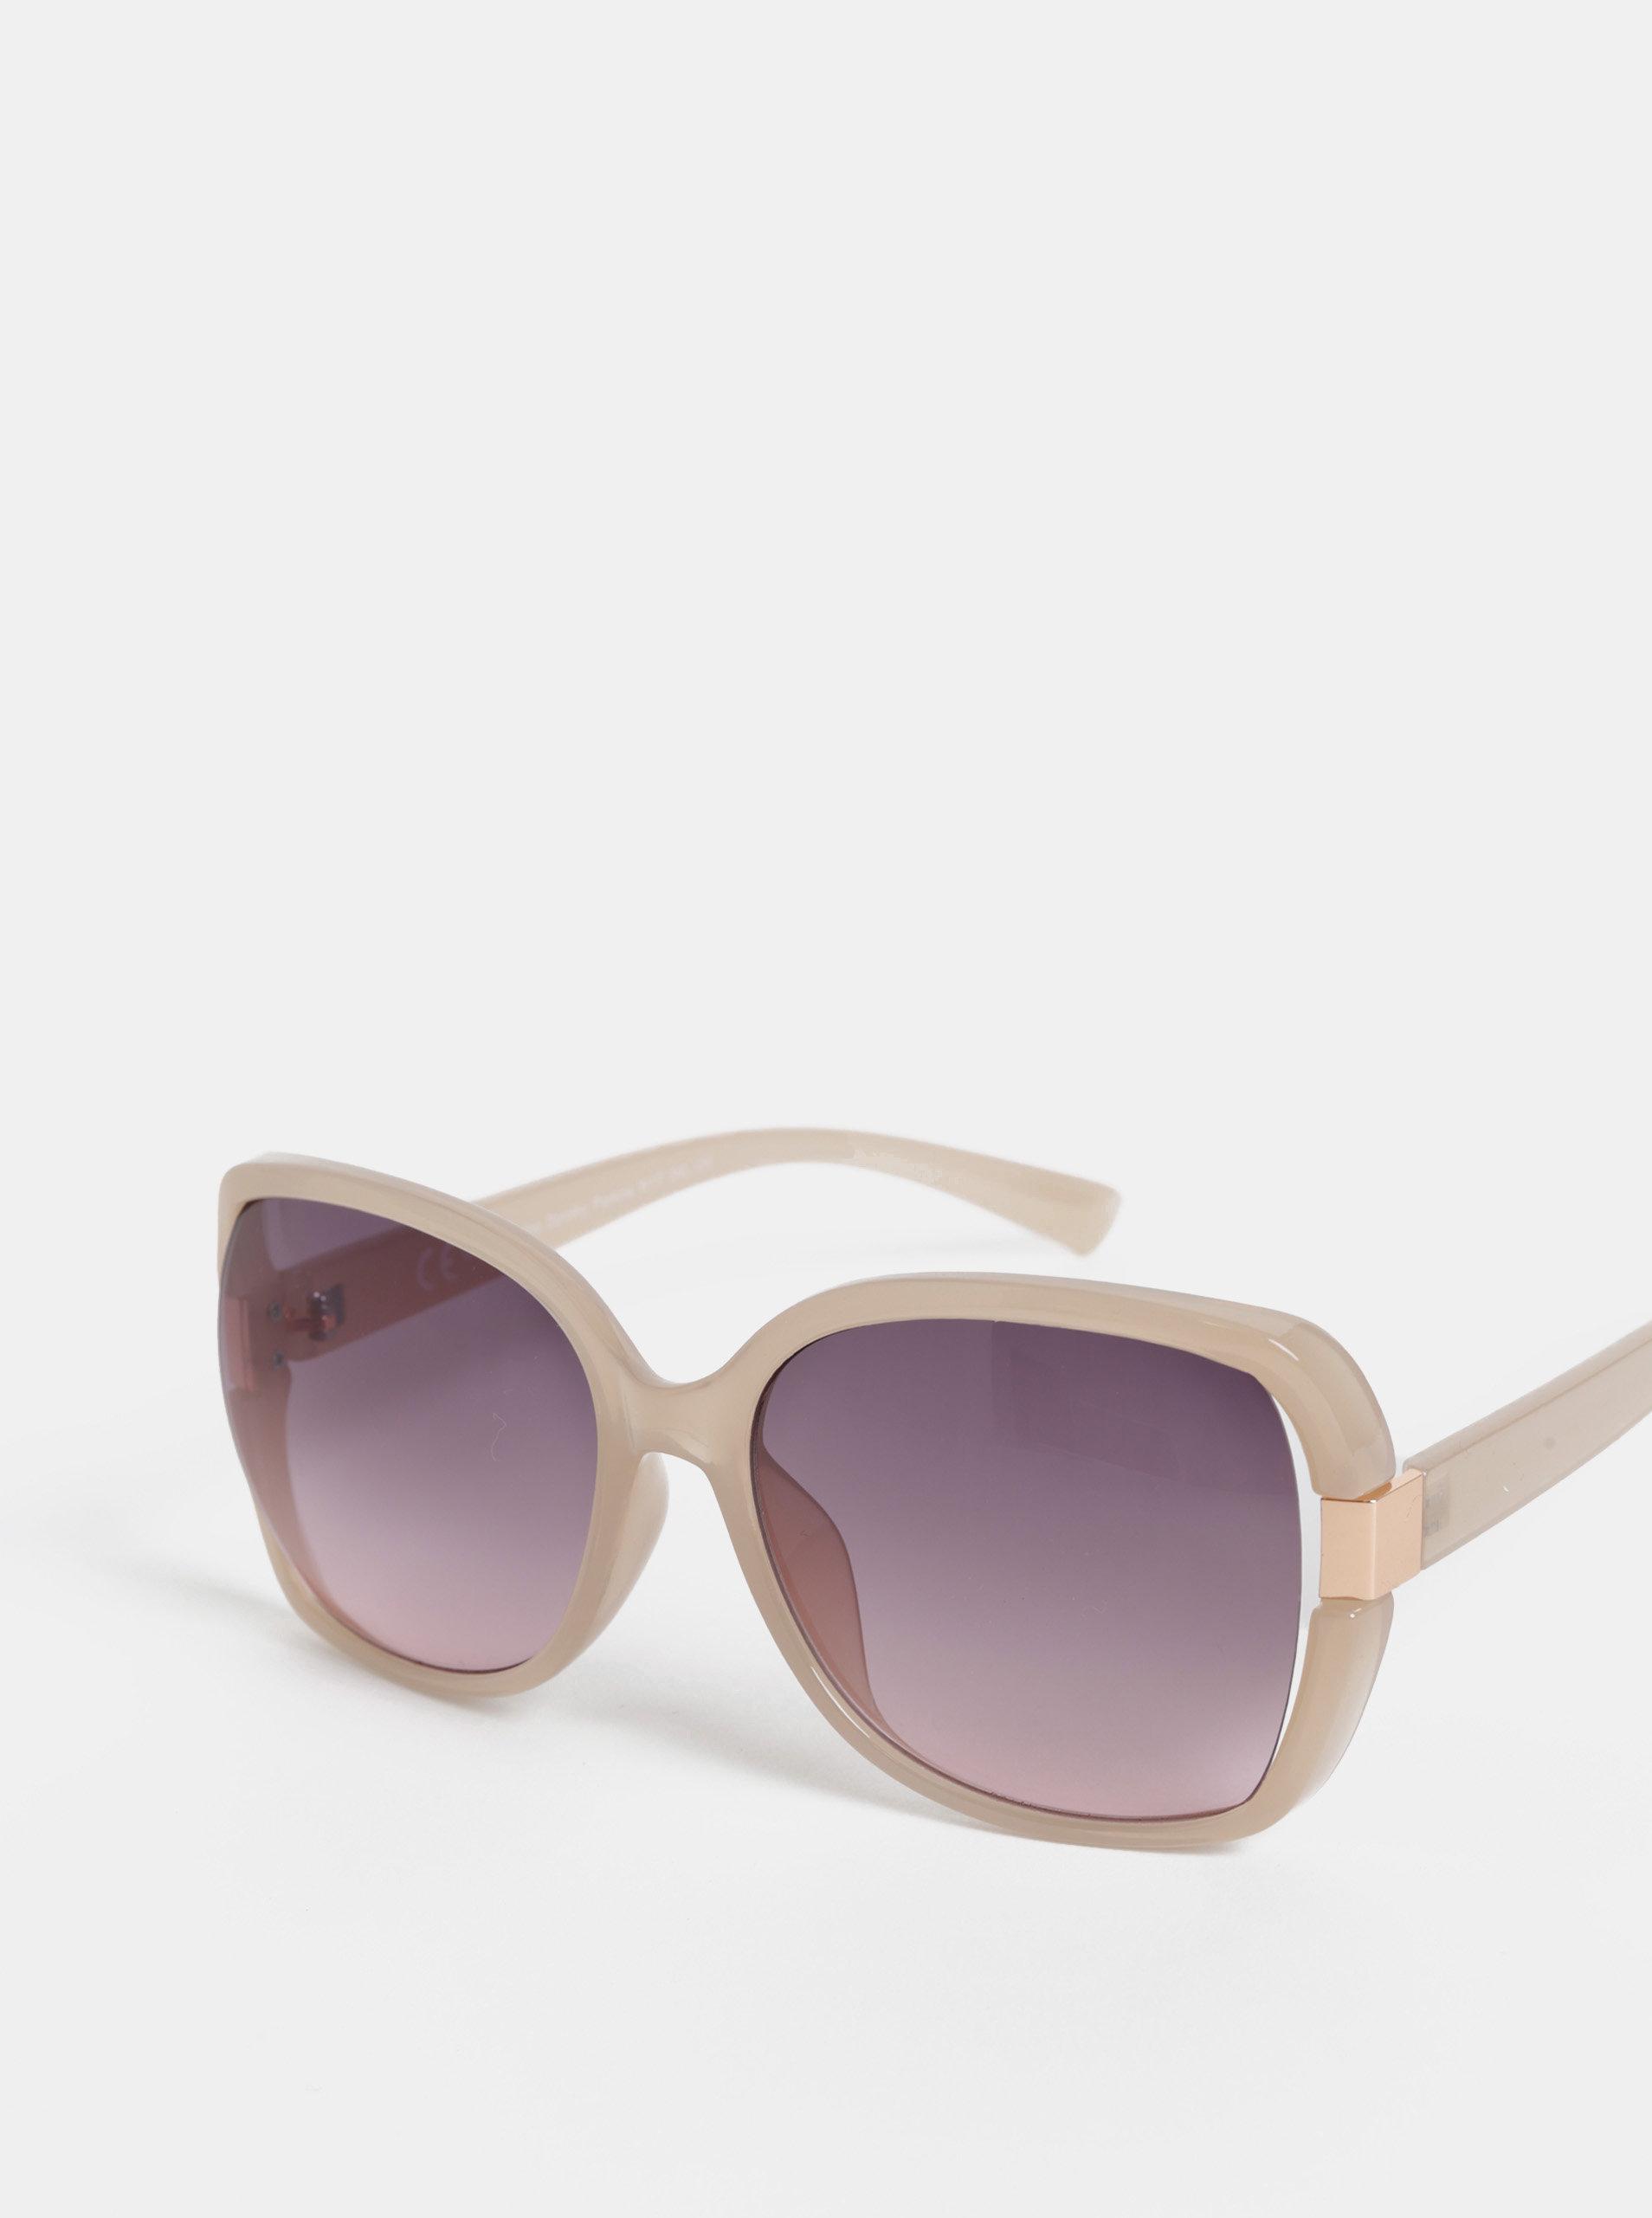 64fec2eea4 Béžové slnečné okuliare Dorothy Perkins ...